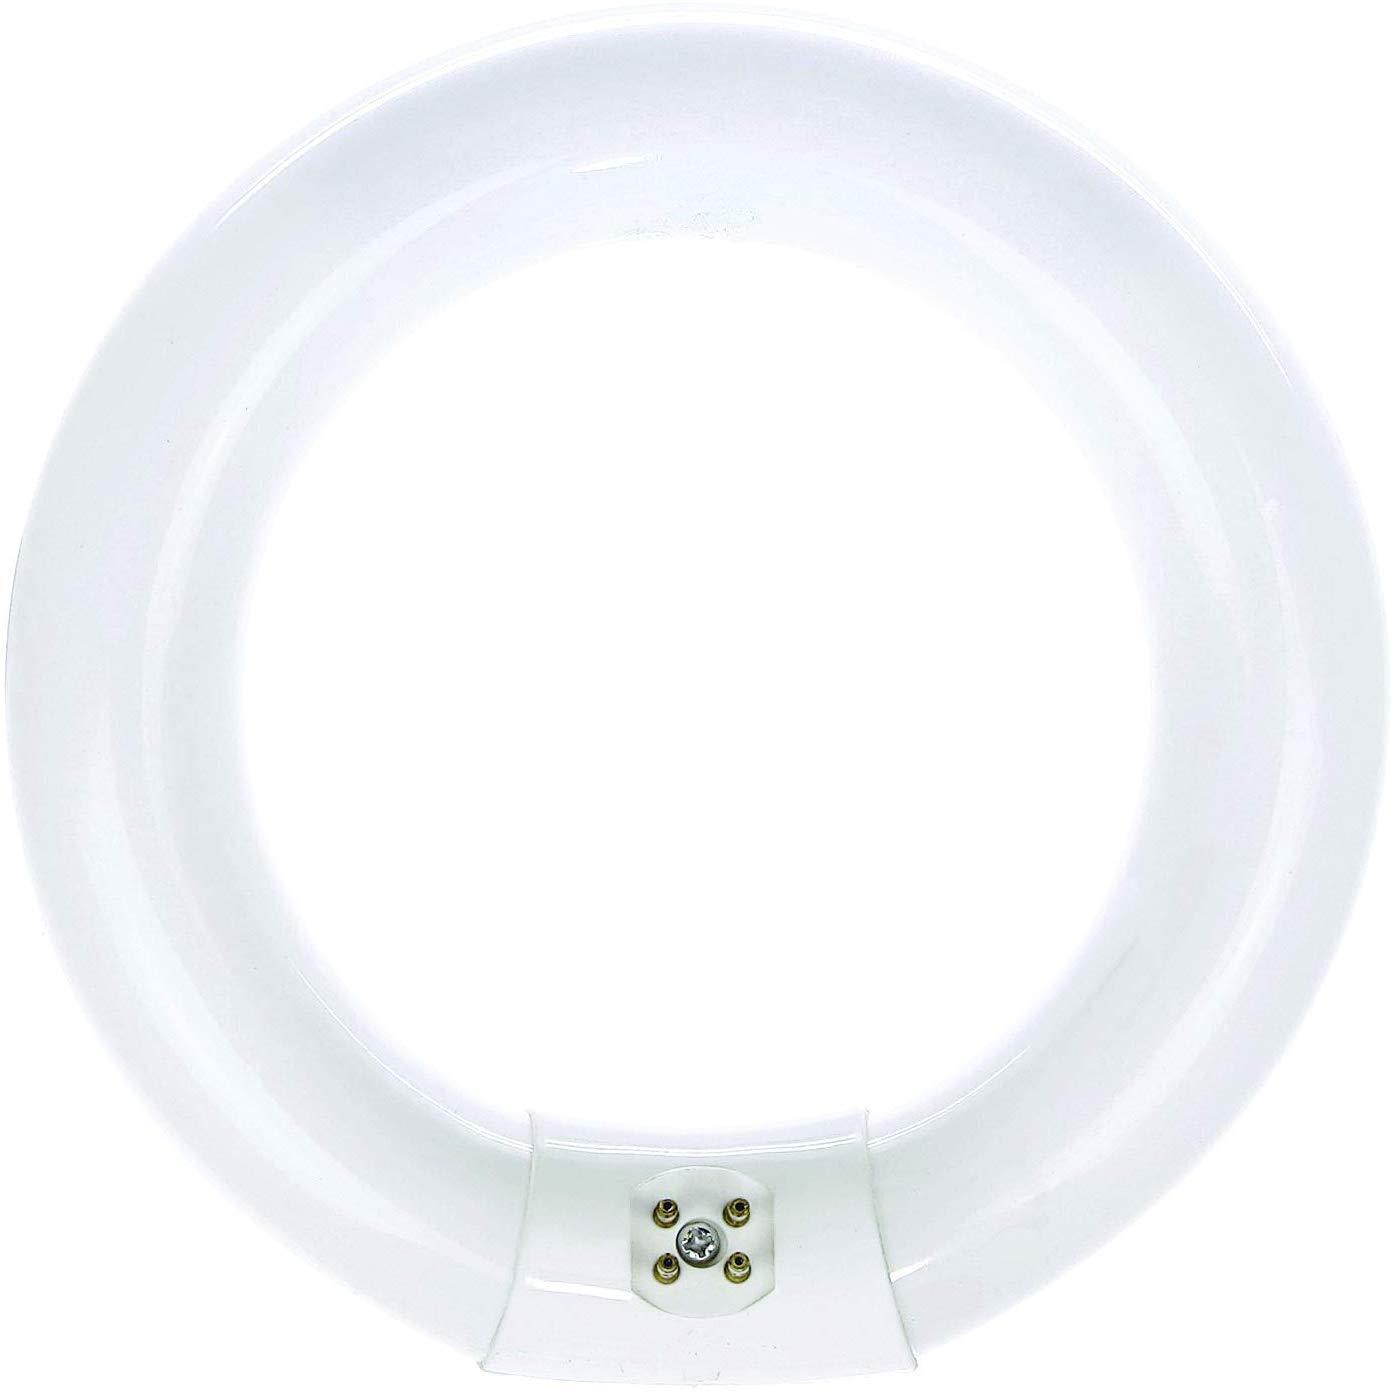 Bulbmaster FC8T9/CW 22 Watt 8 Inch Round T9 Fluorescent Circular Light Bulb, Cool White 4100K, 1120 Lumens G10Q 4-Pin Base 22W Circline Ceiling Lights